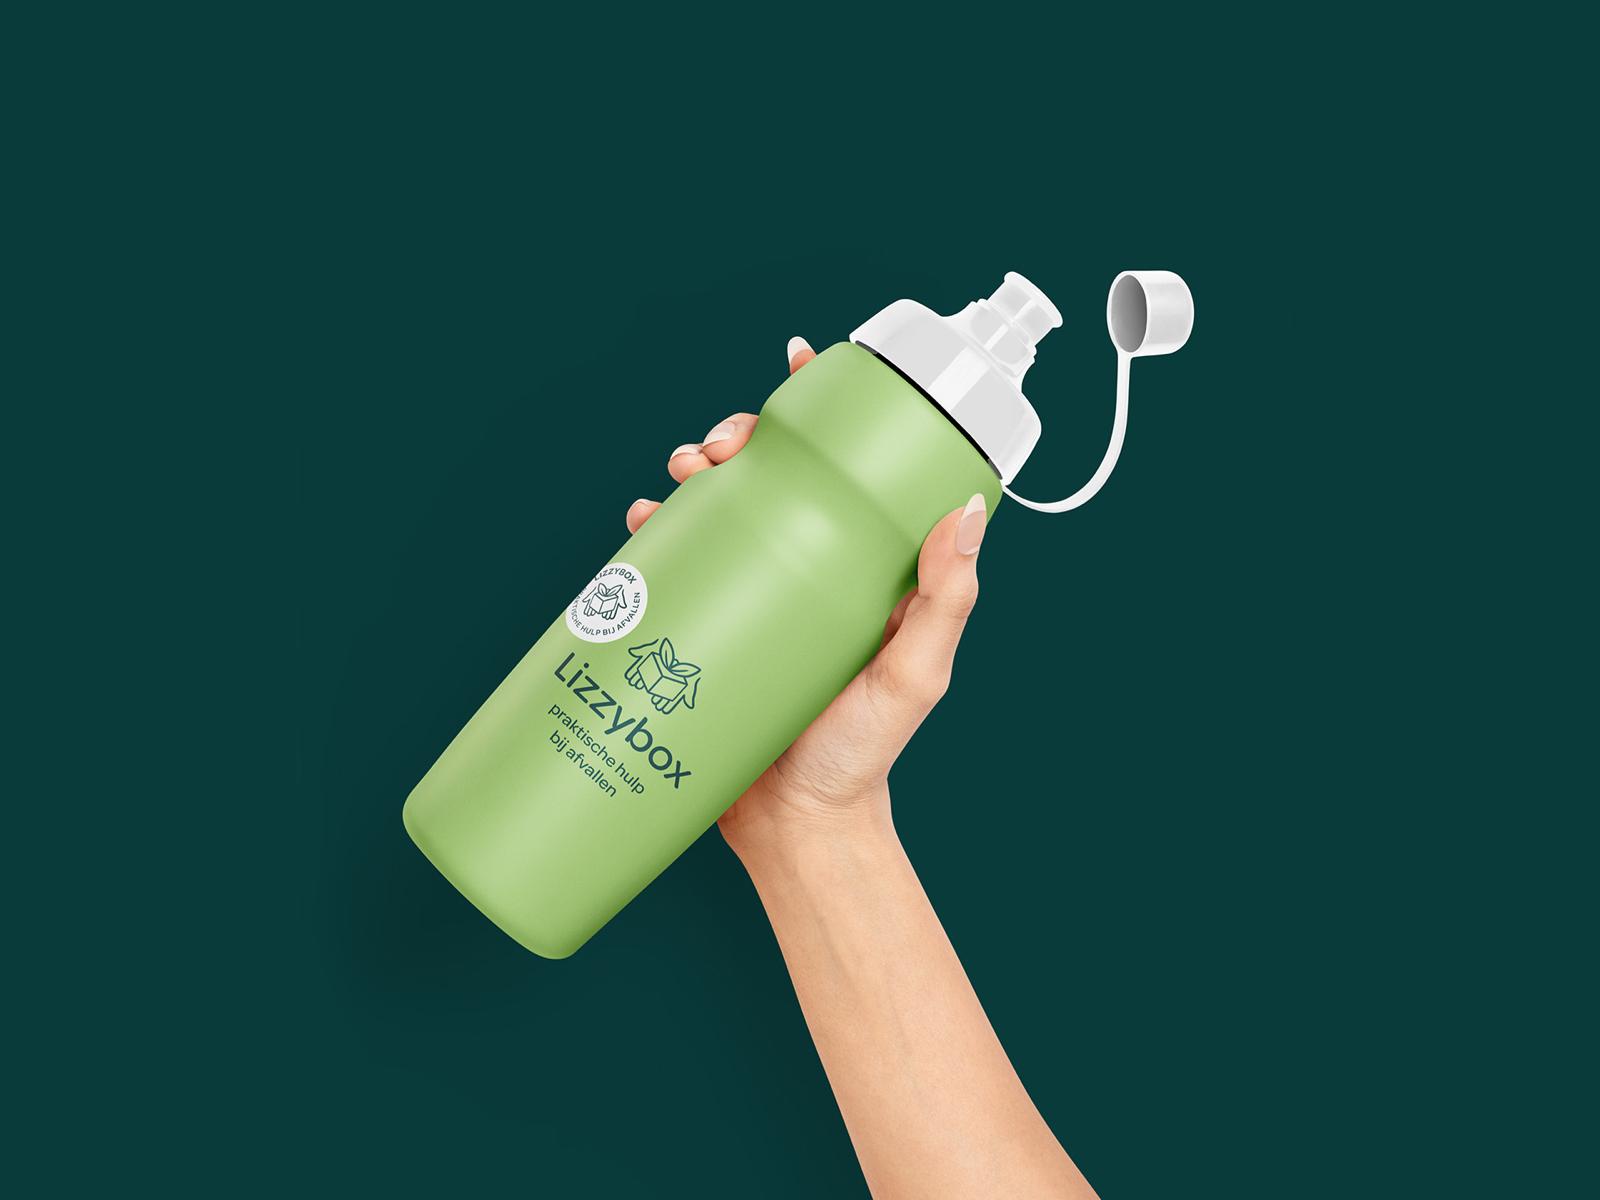 Lizzybox Branding: Sports bottle